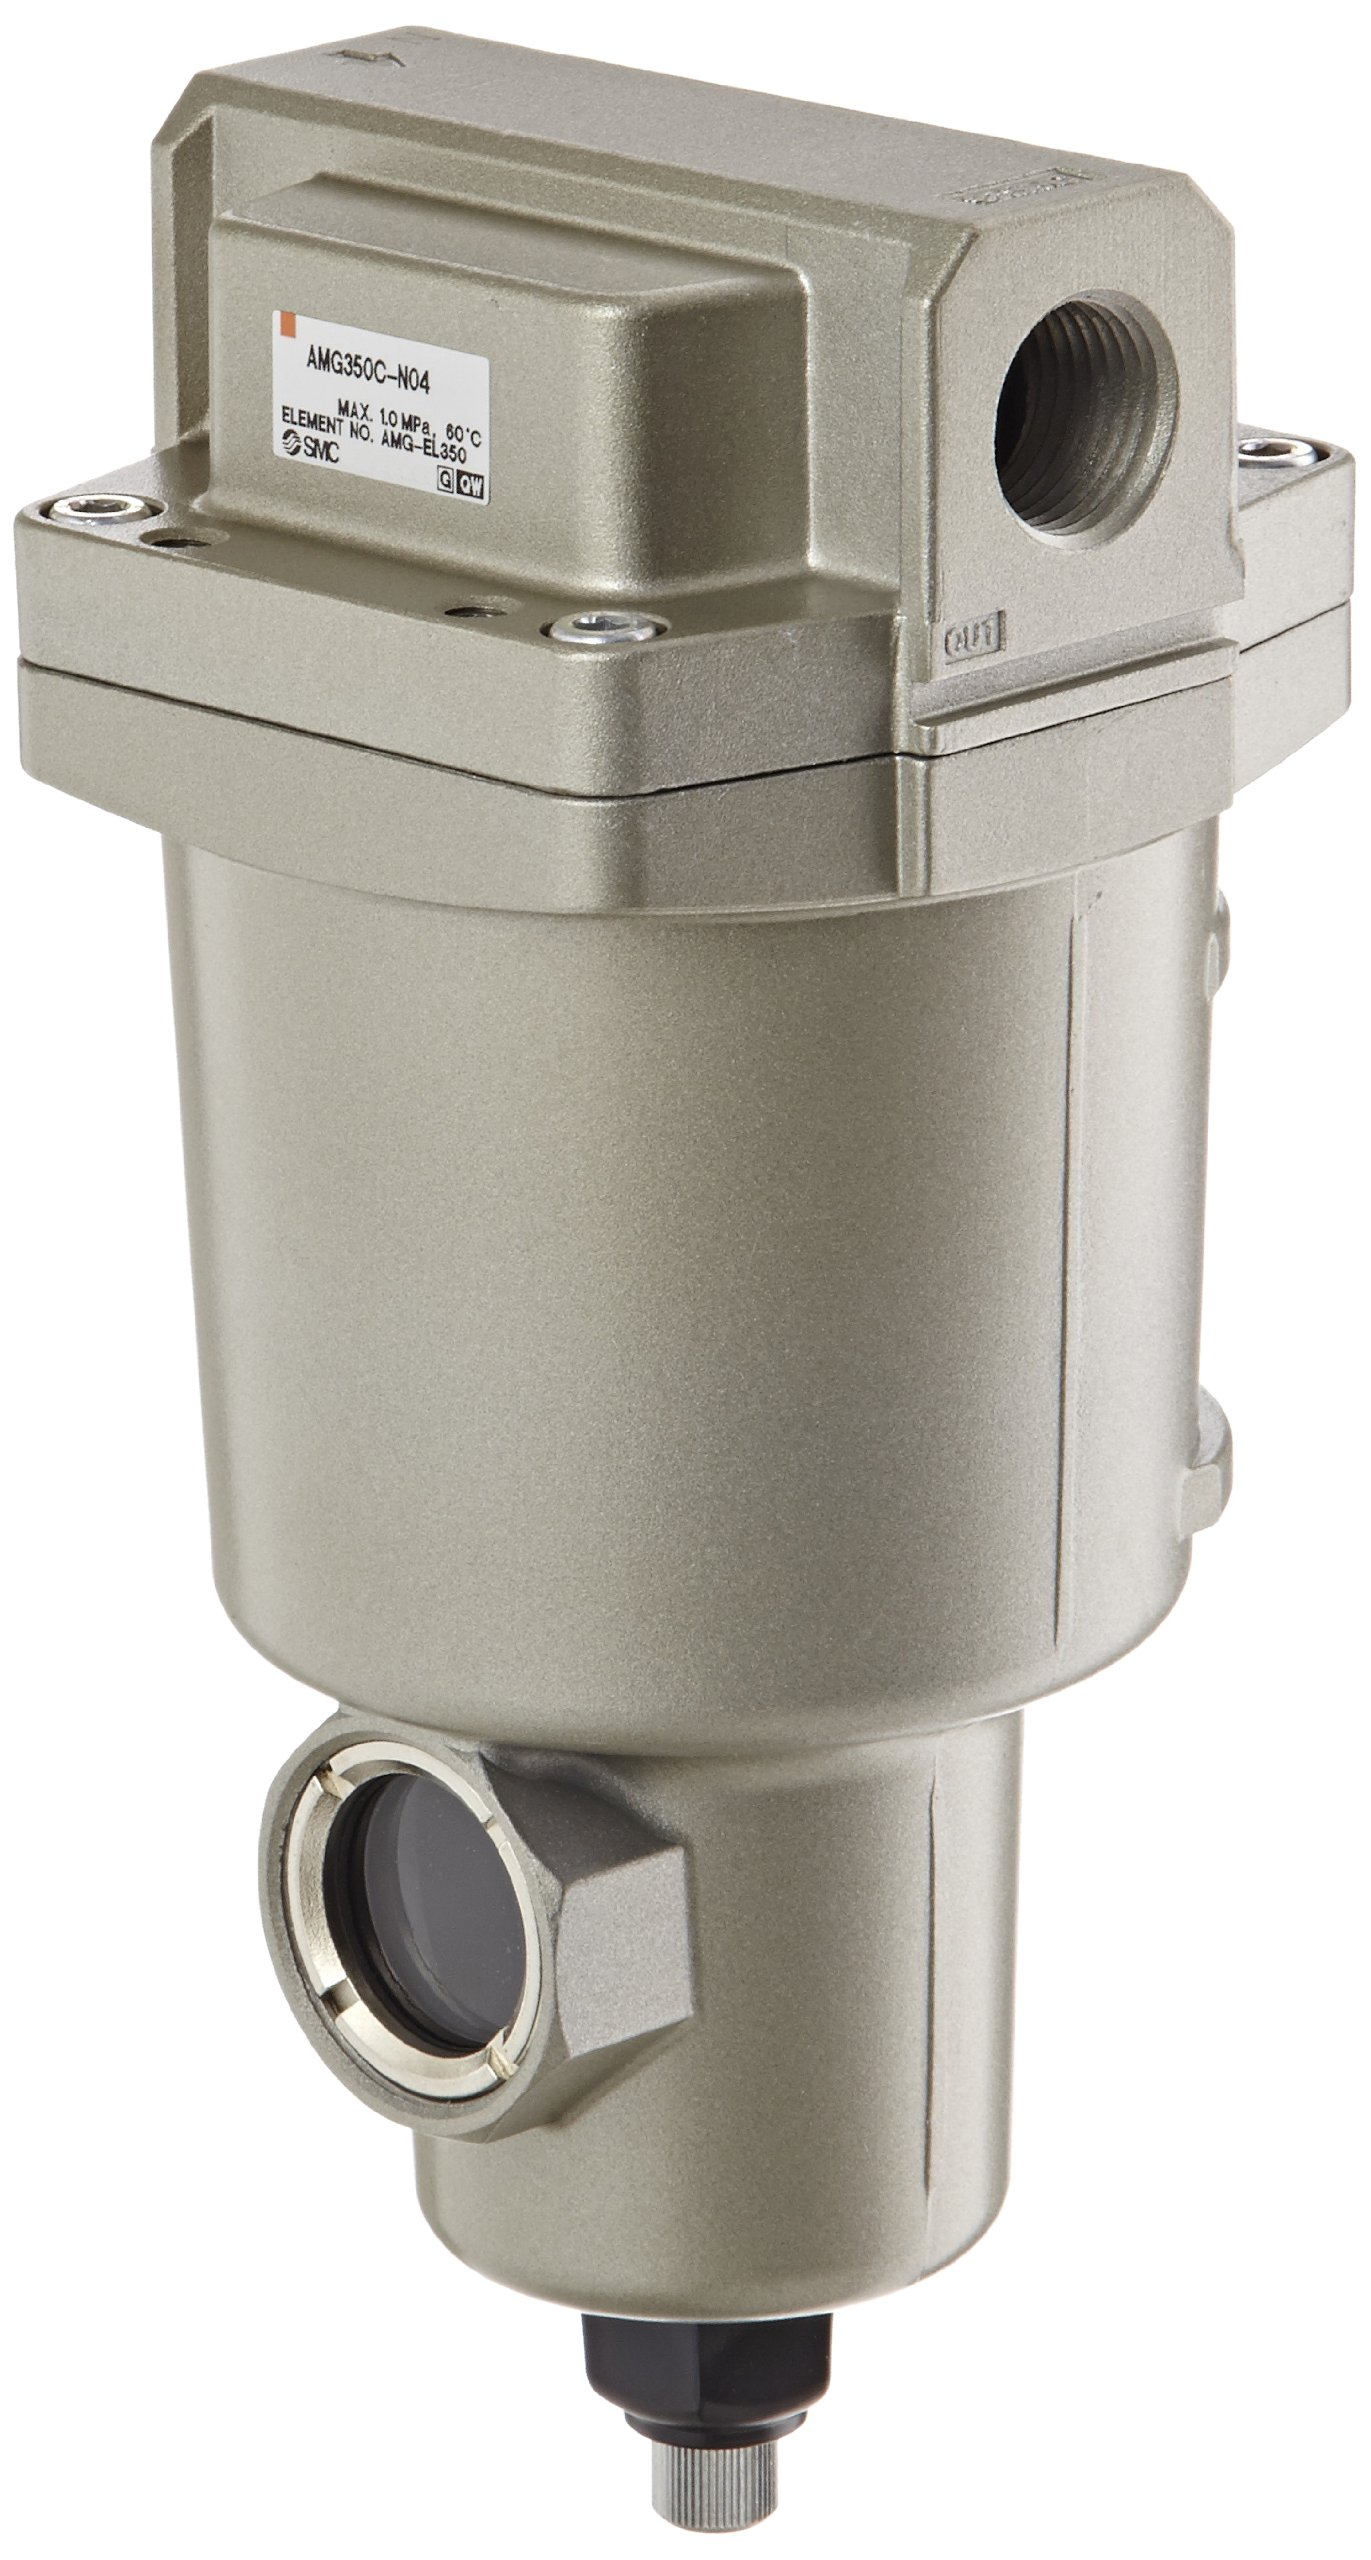 SMC AMG350C-N04 Water Separator, Manual Drain, 1,500 L/min, 1/2'' NPT by SMC